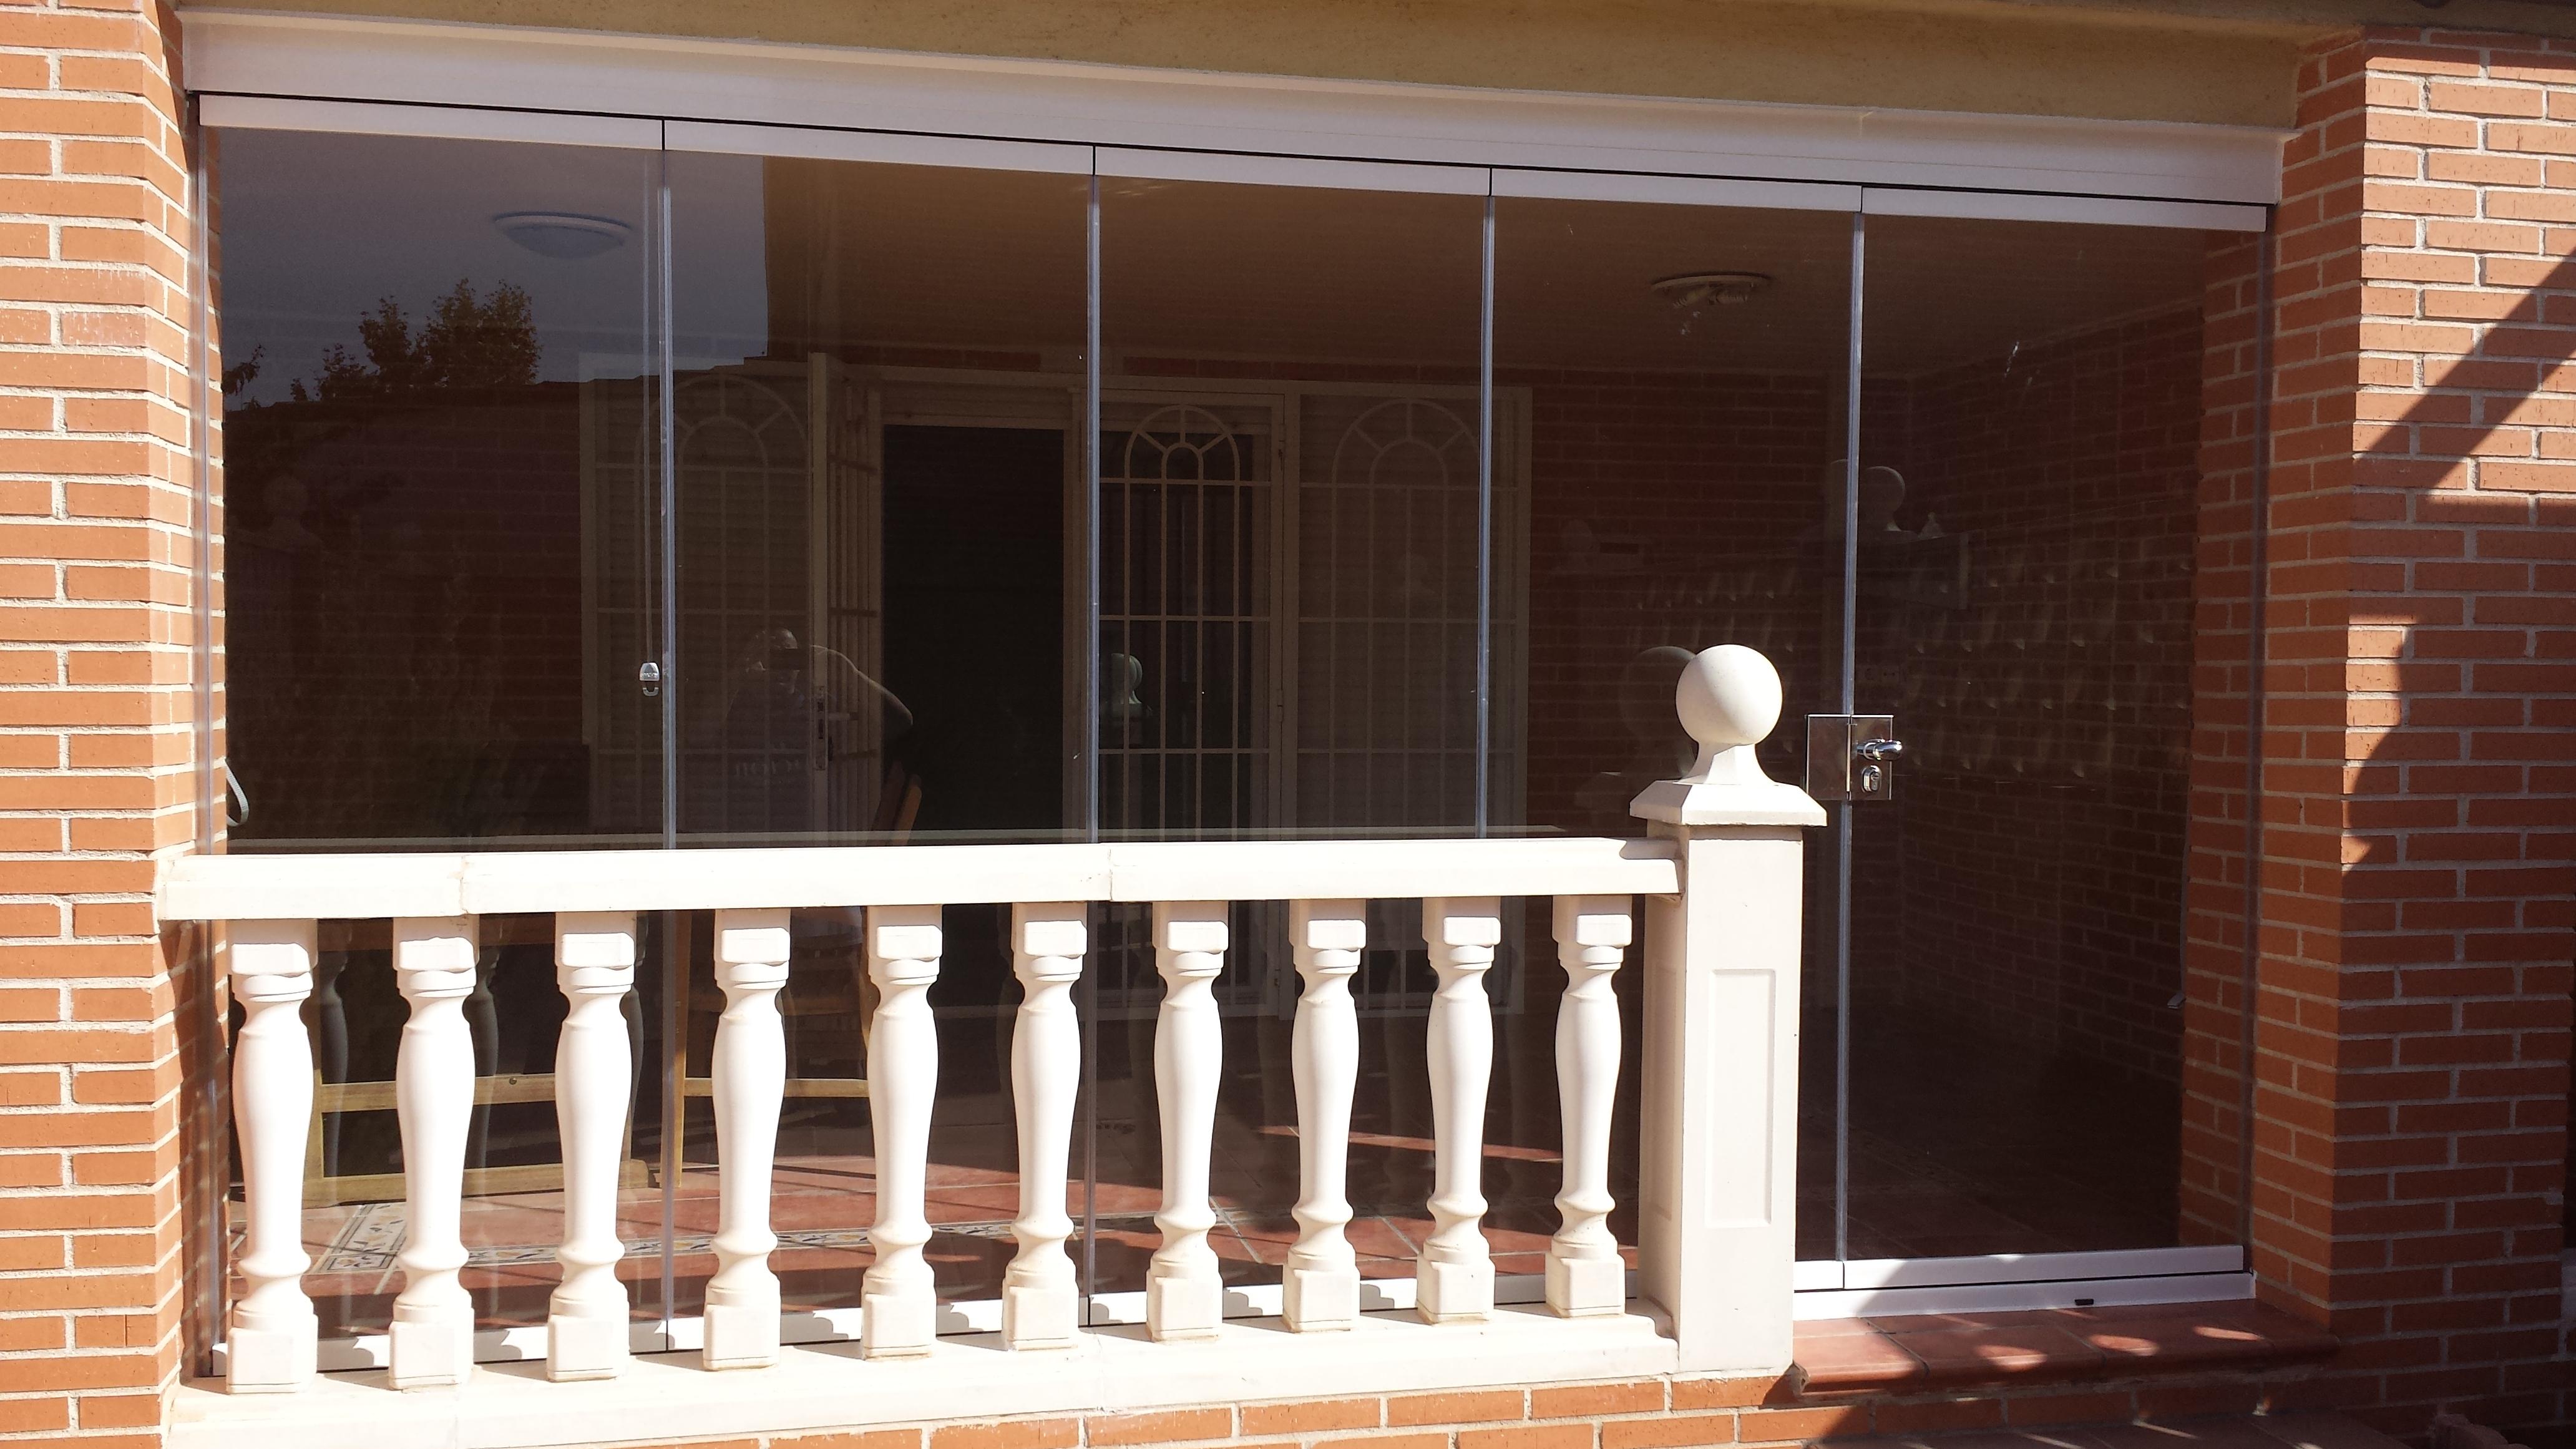 Cerramiento con cortina de cristal aluminios villalba for Cerramiento cortina cristal